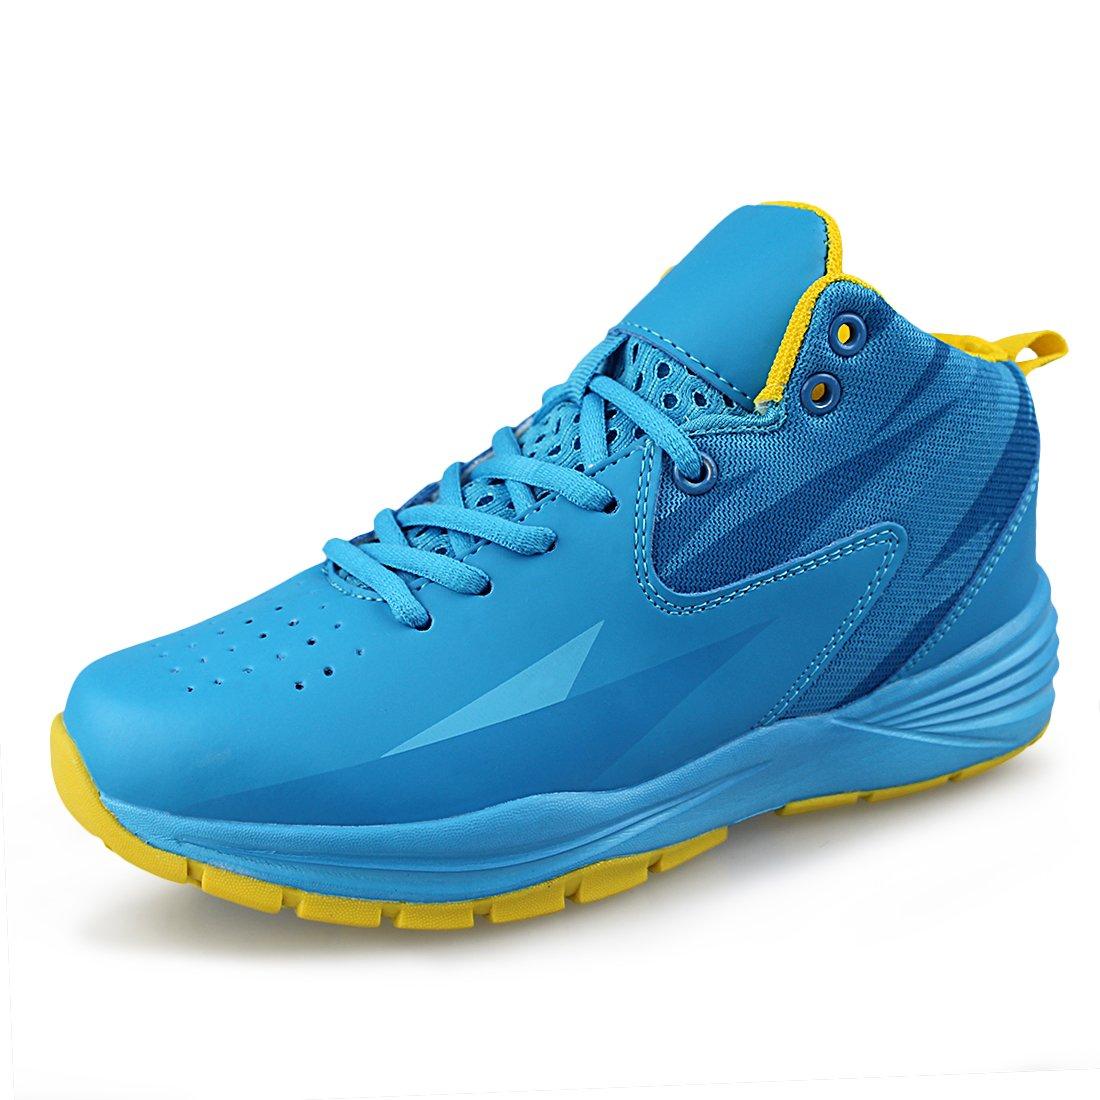 Hawkwell Kids Casual Outdoor Basketball Shoes(Little Kid/Big Kid),Blue PU,1 M US